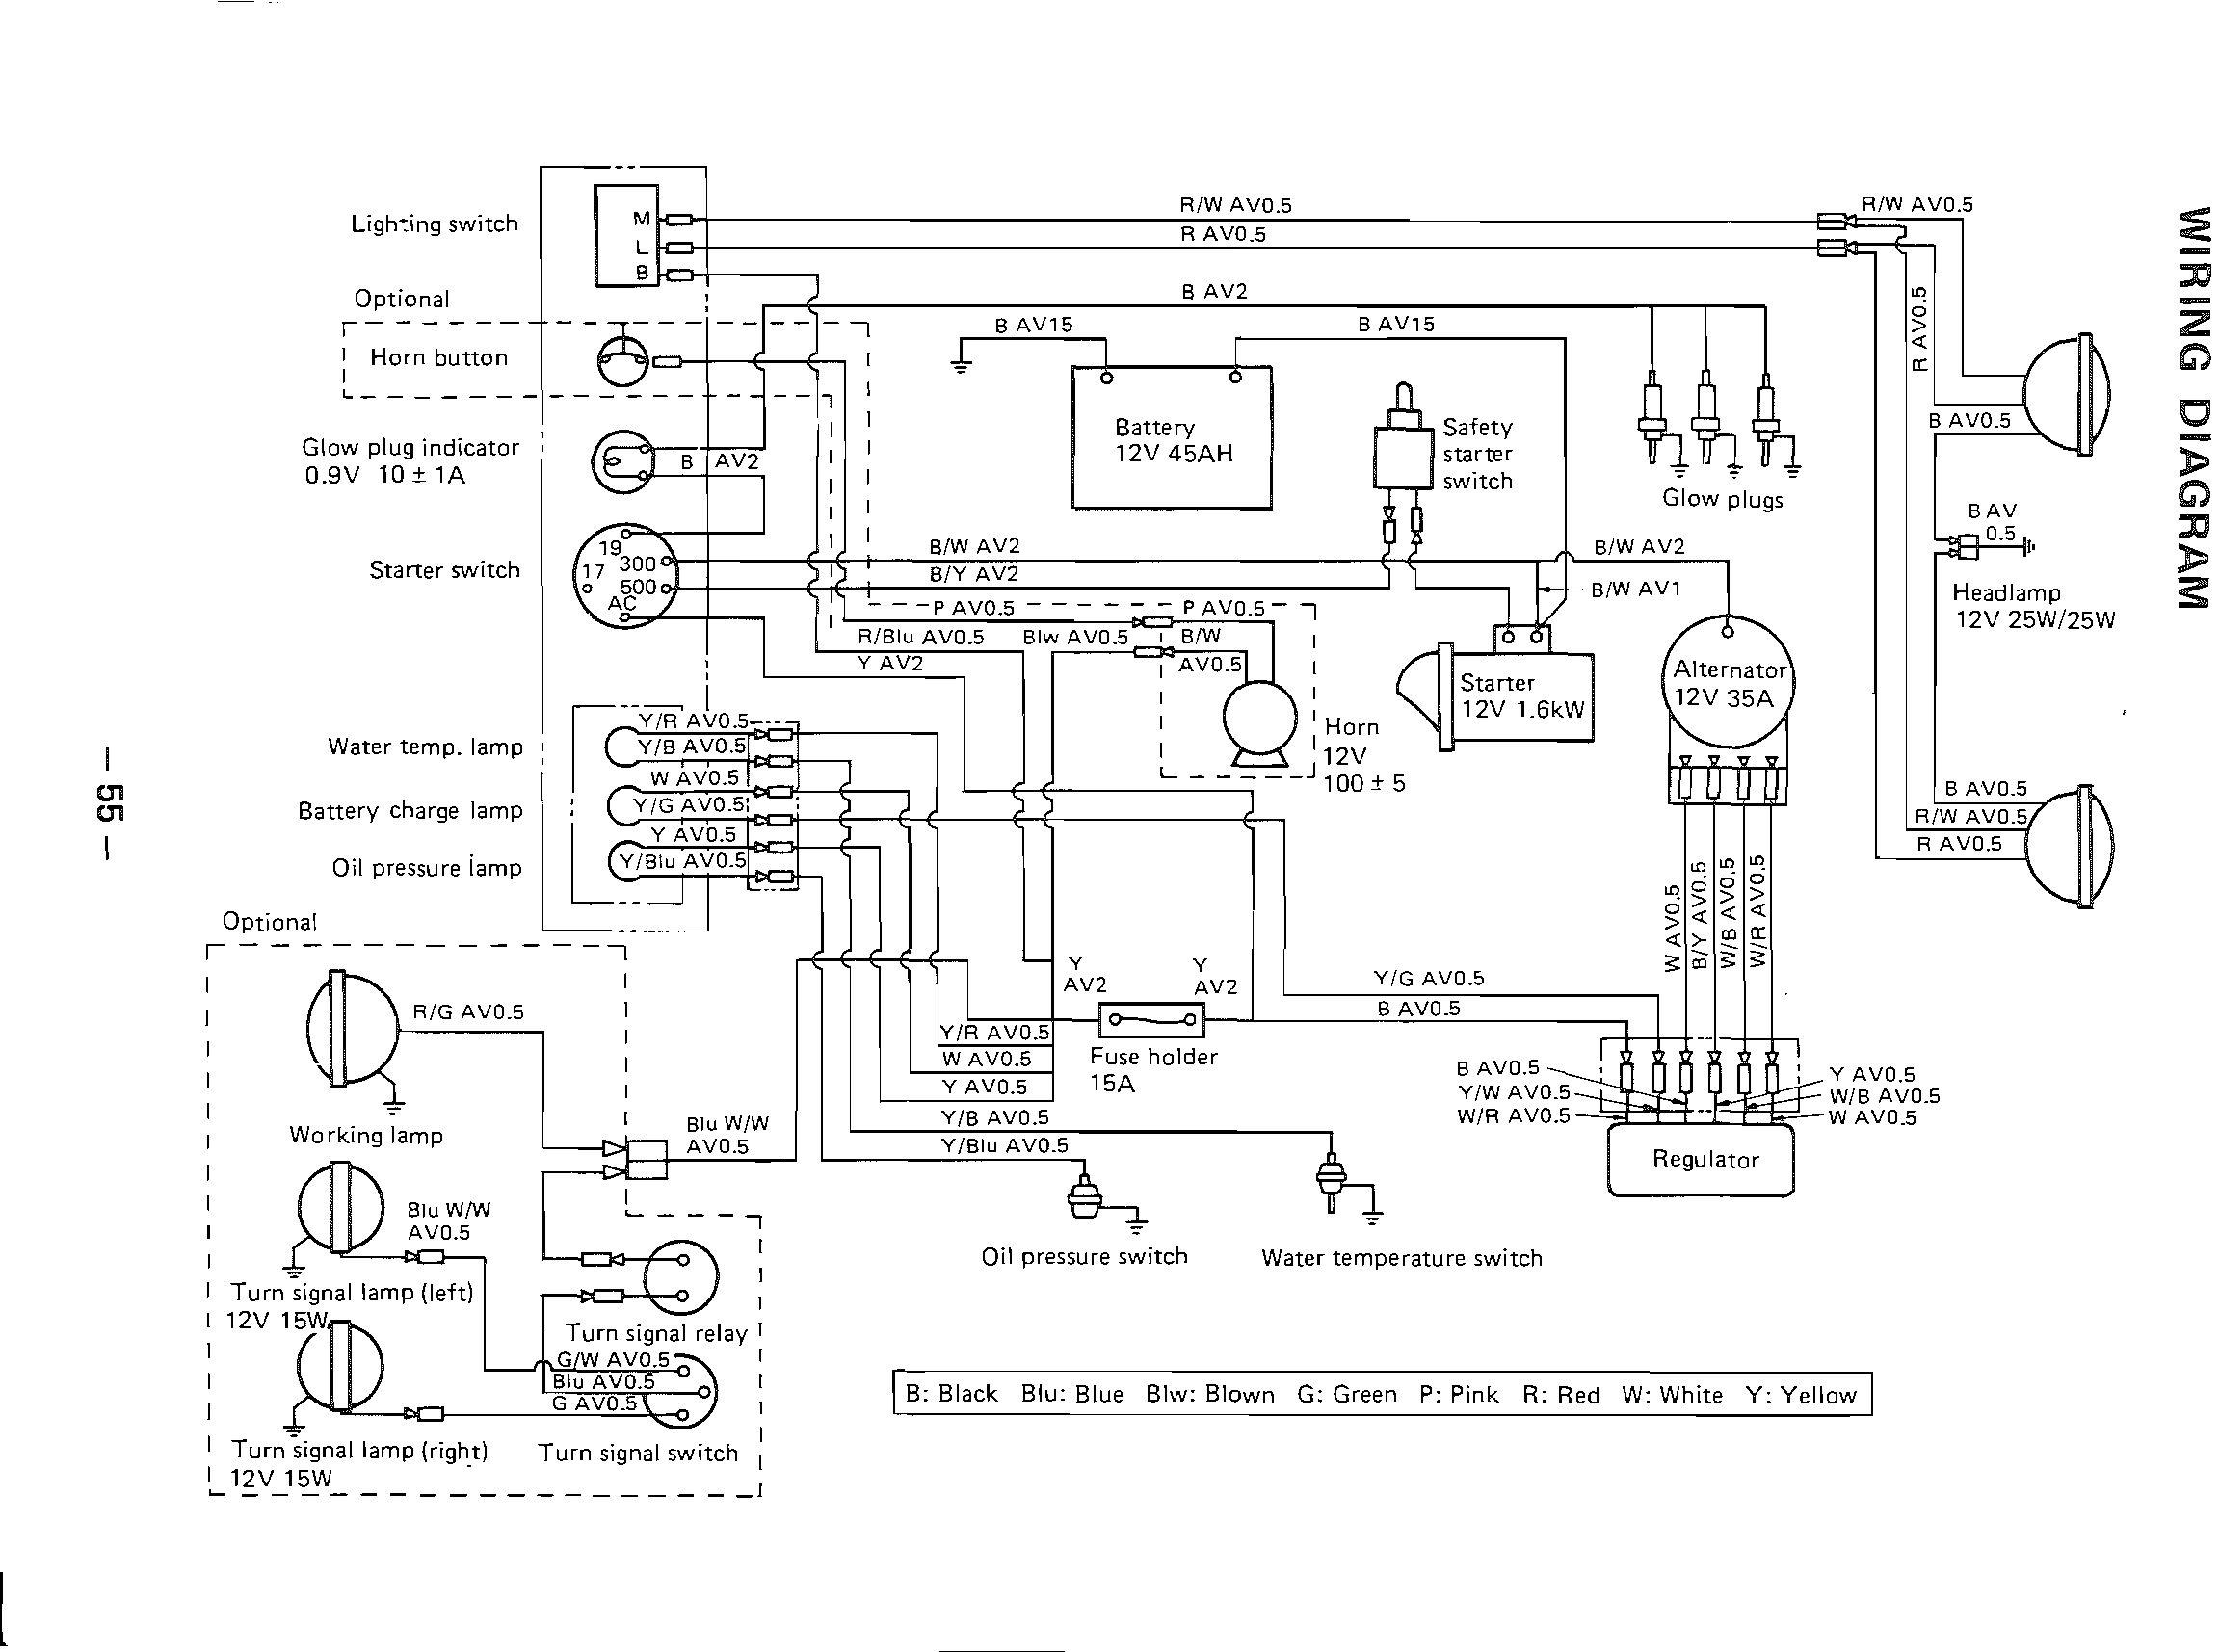 [DIAGRAM] Hyundai Hd65 Wiring Diagram FULL Version HD